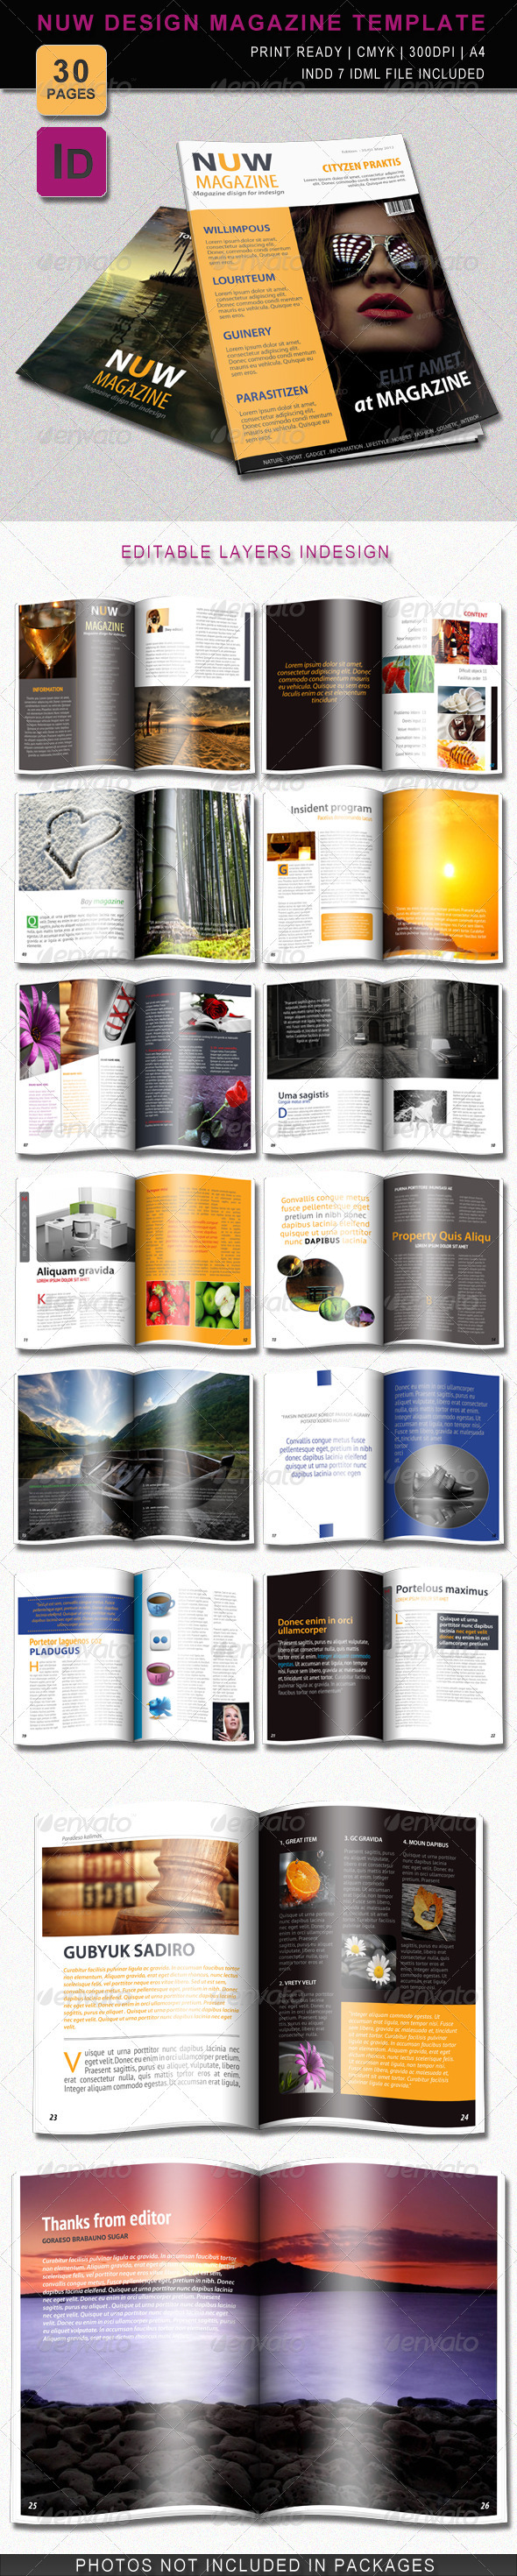 GraphicRiver Nuw Design Magazine Template 2298086